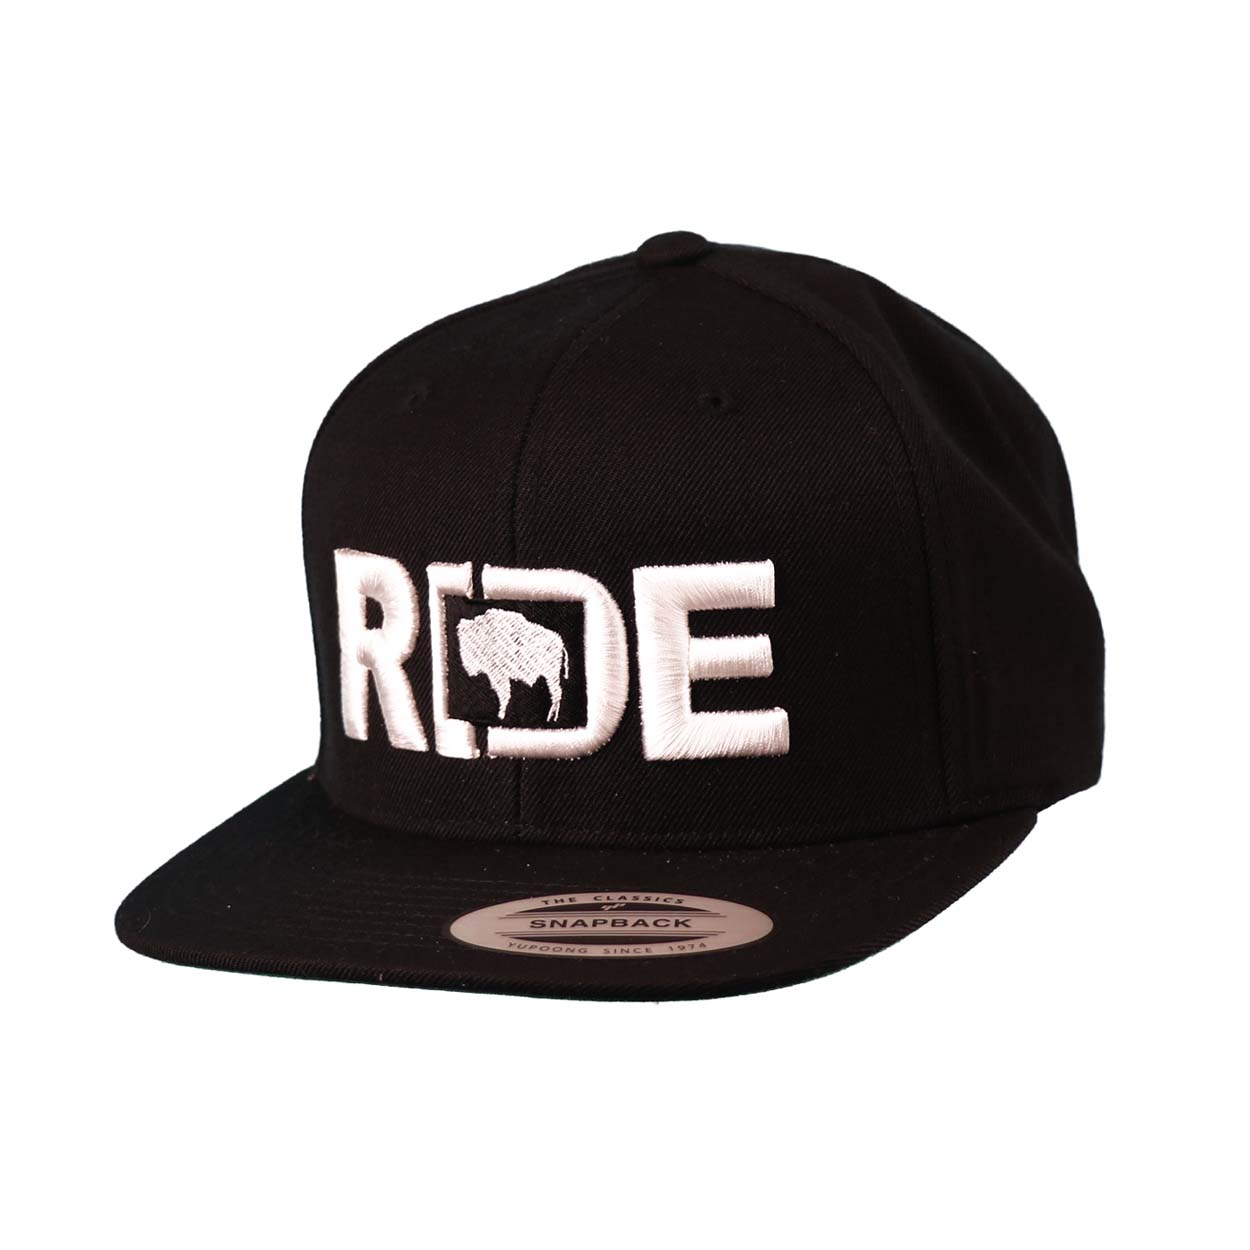 Ride Wyoming Classic Embroidered  Snapback Flat Brim Hat Black/White